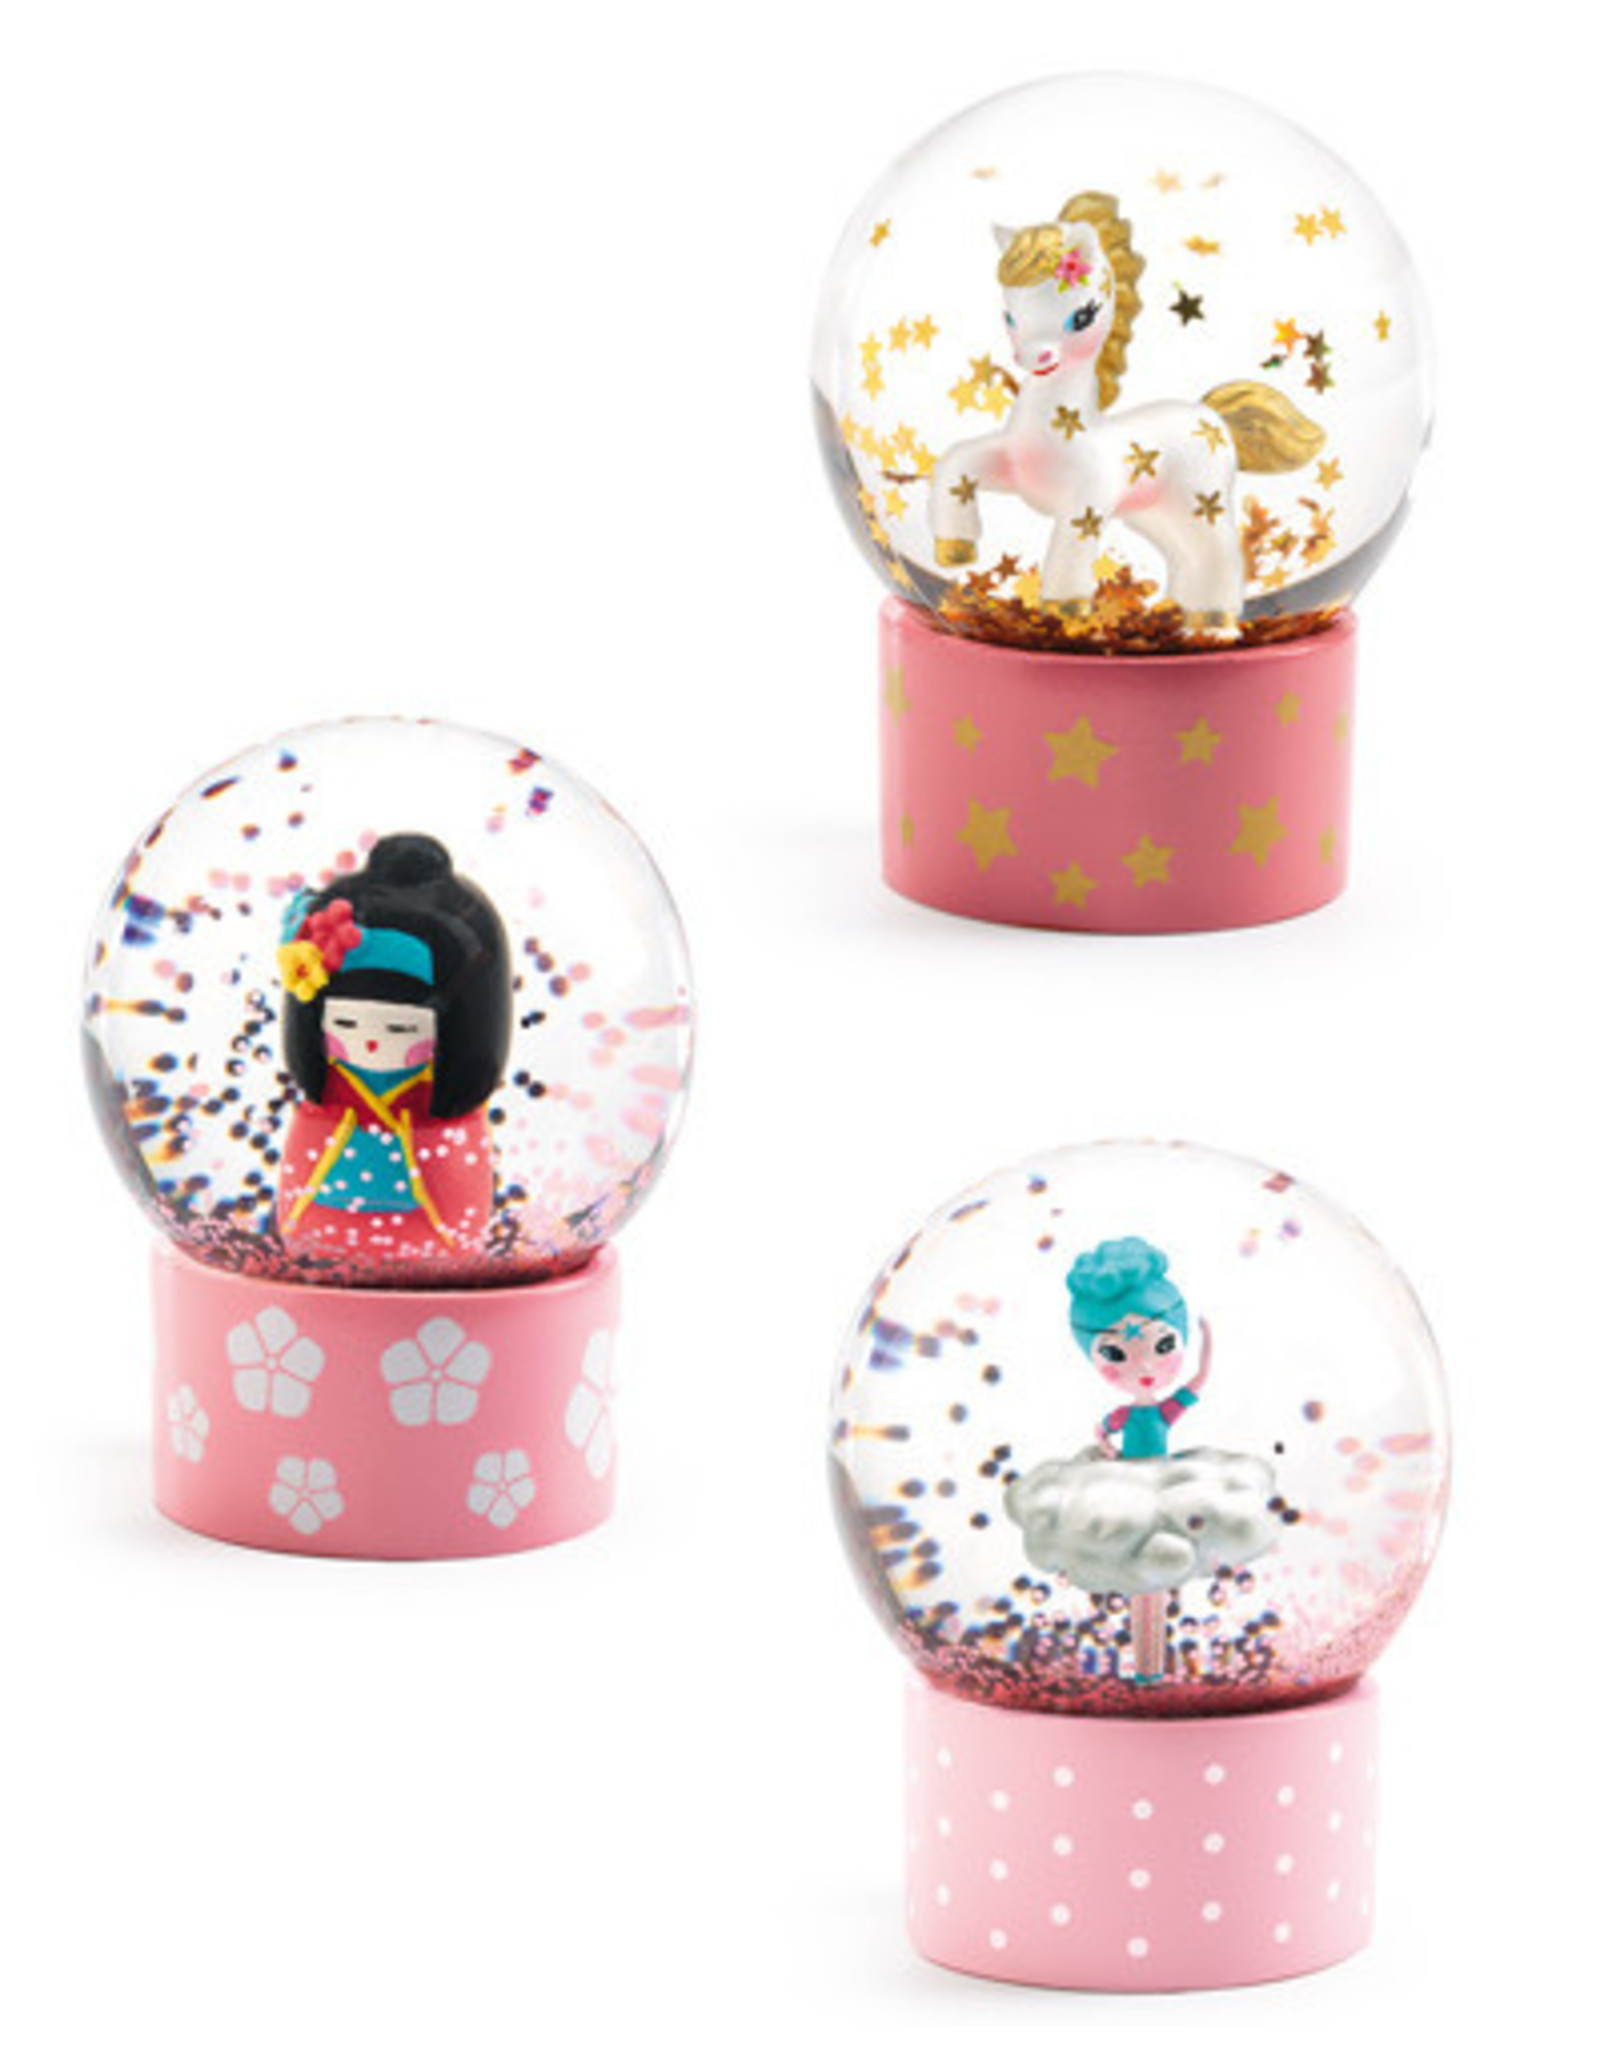 Djeco Snow Globe Assortment, So Cute!